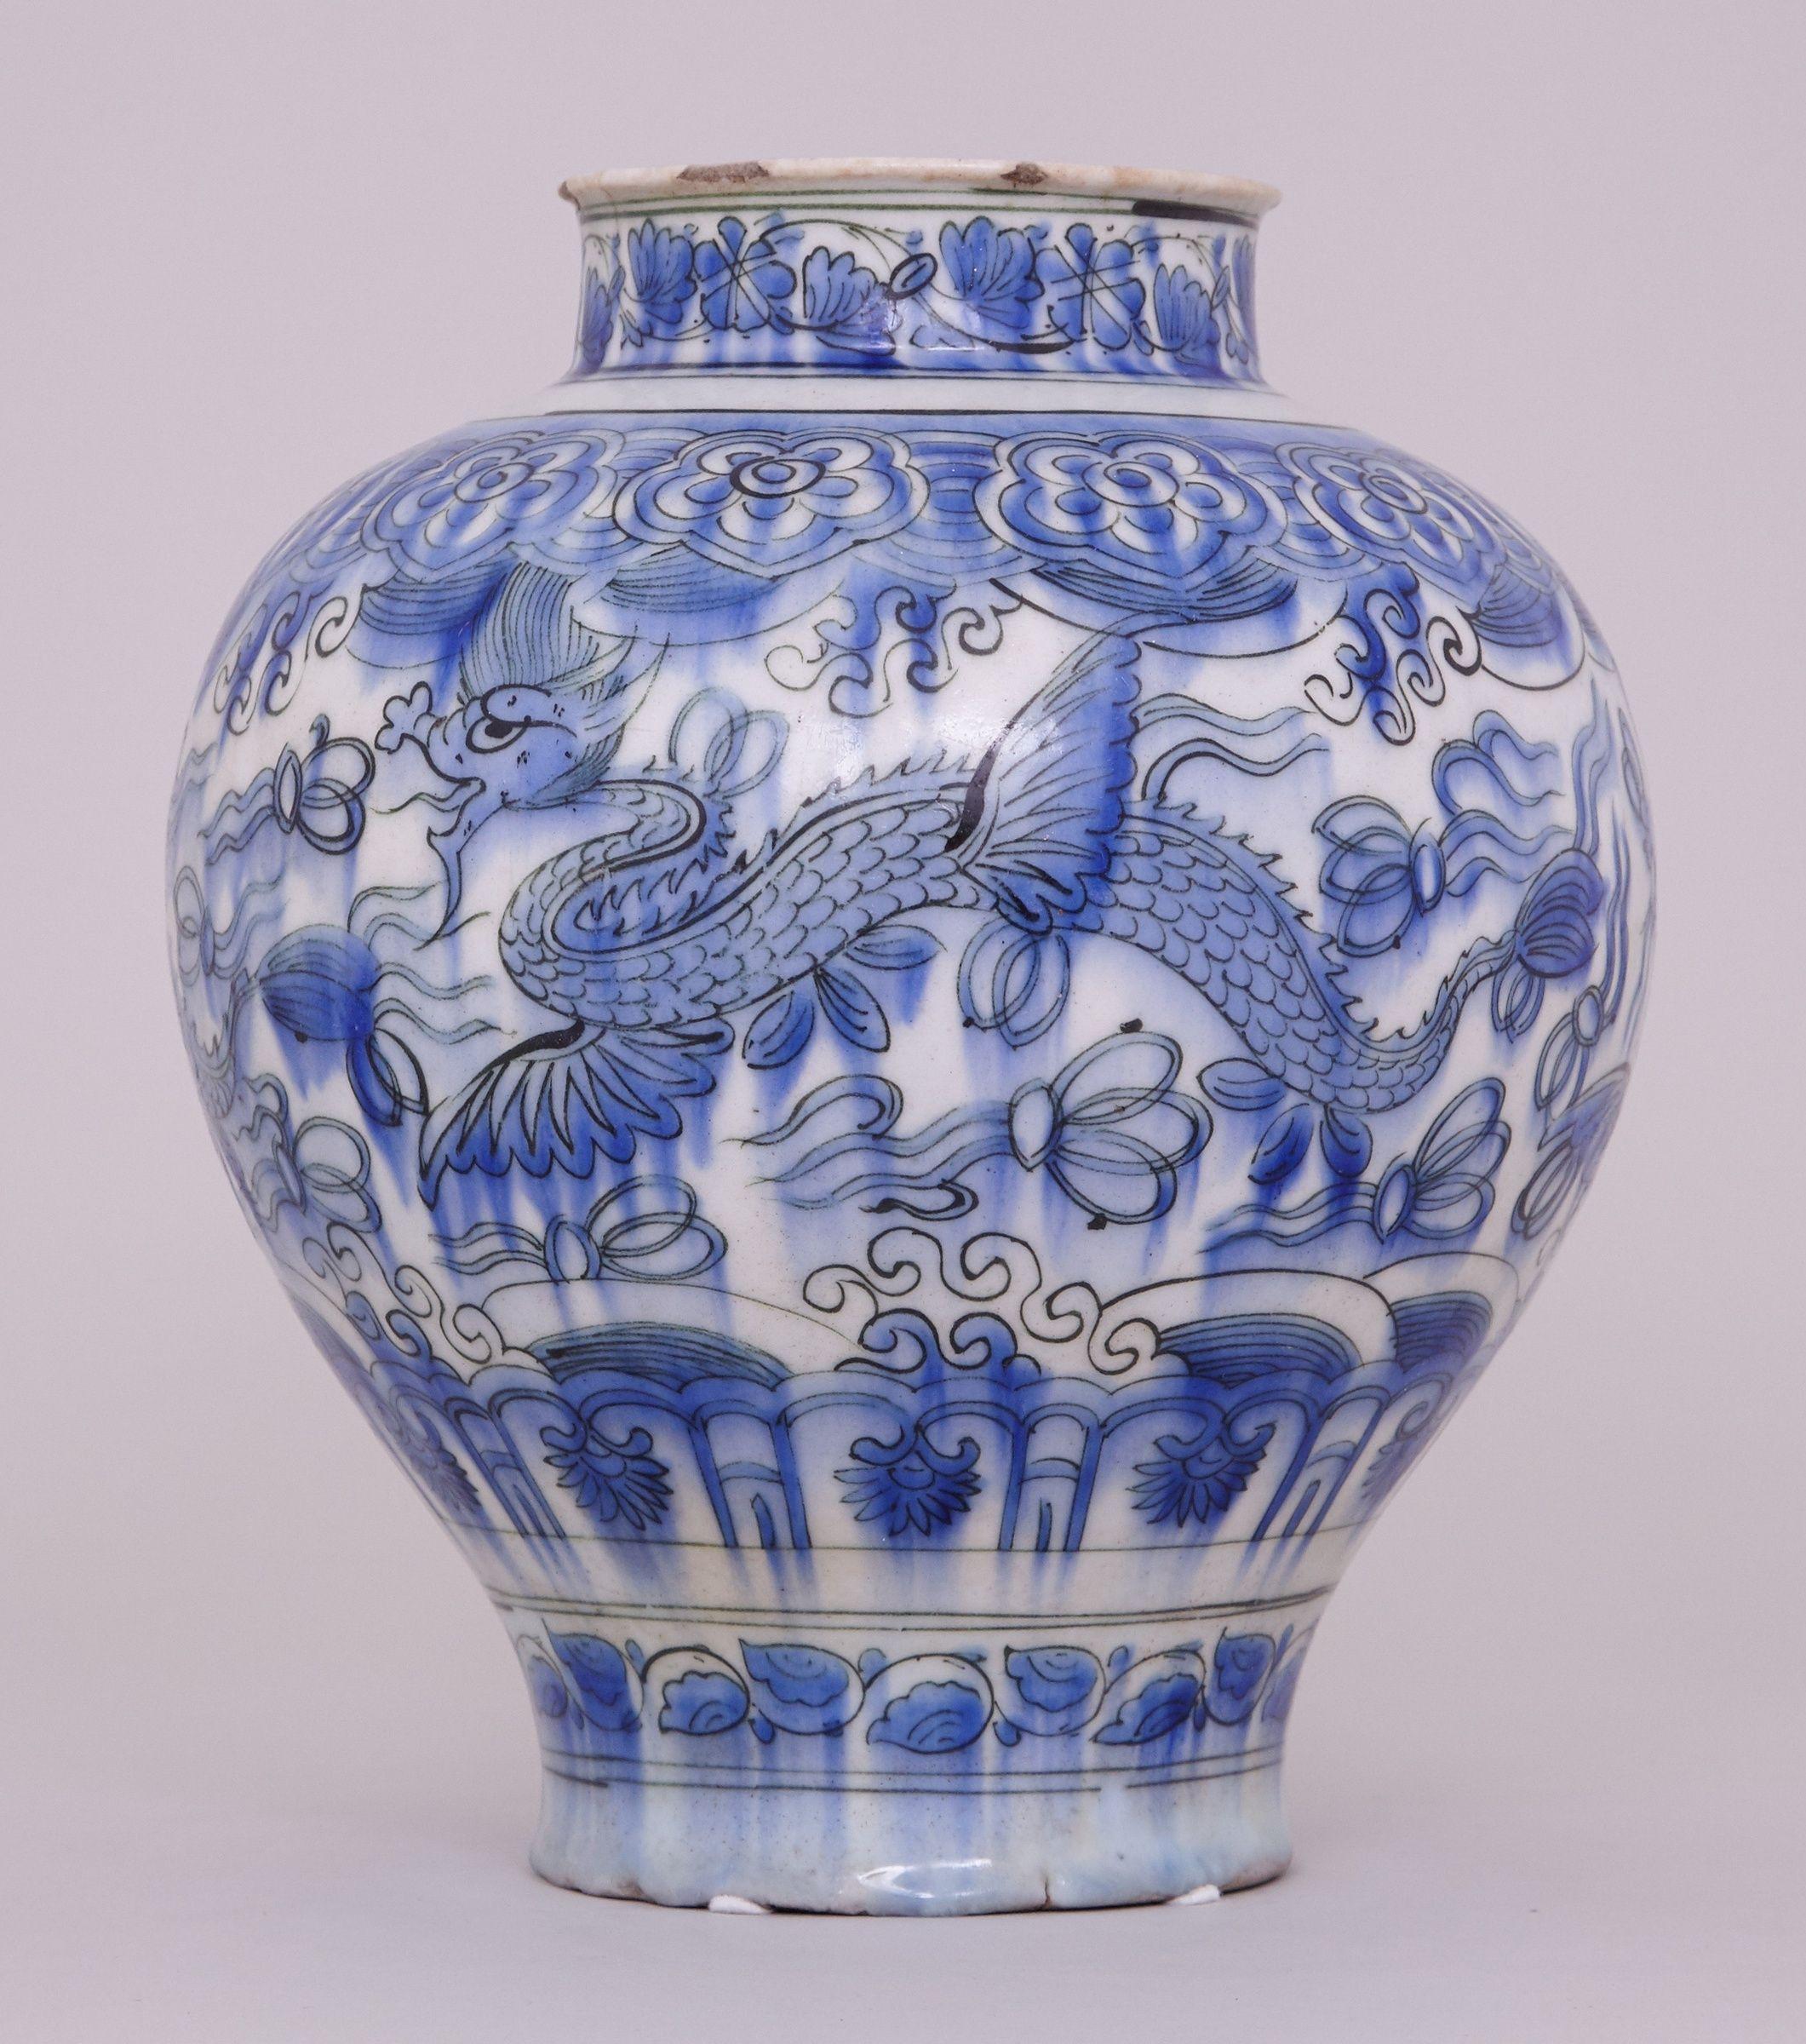 blue and brown ceramic vase of white pottery vase elegant a blue and white persian safavid jar 17th inside white pottery vase elegant a blue and white persian safavid jar 17th century